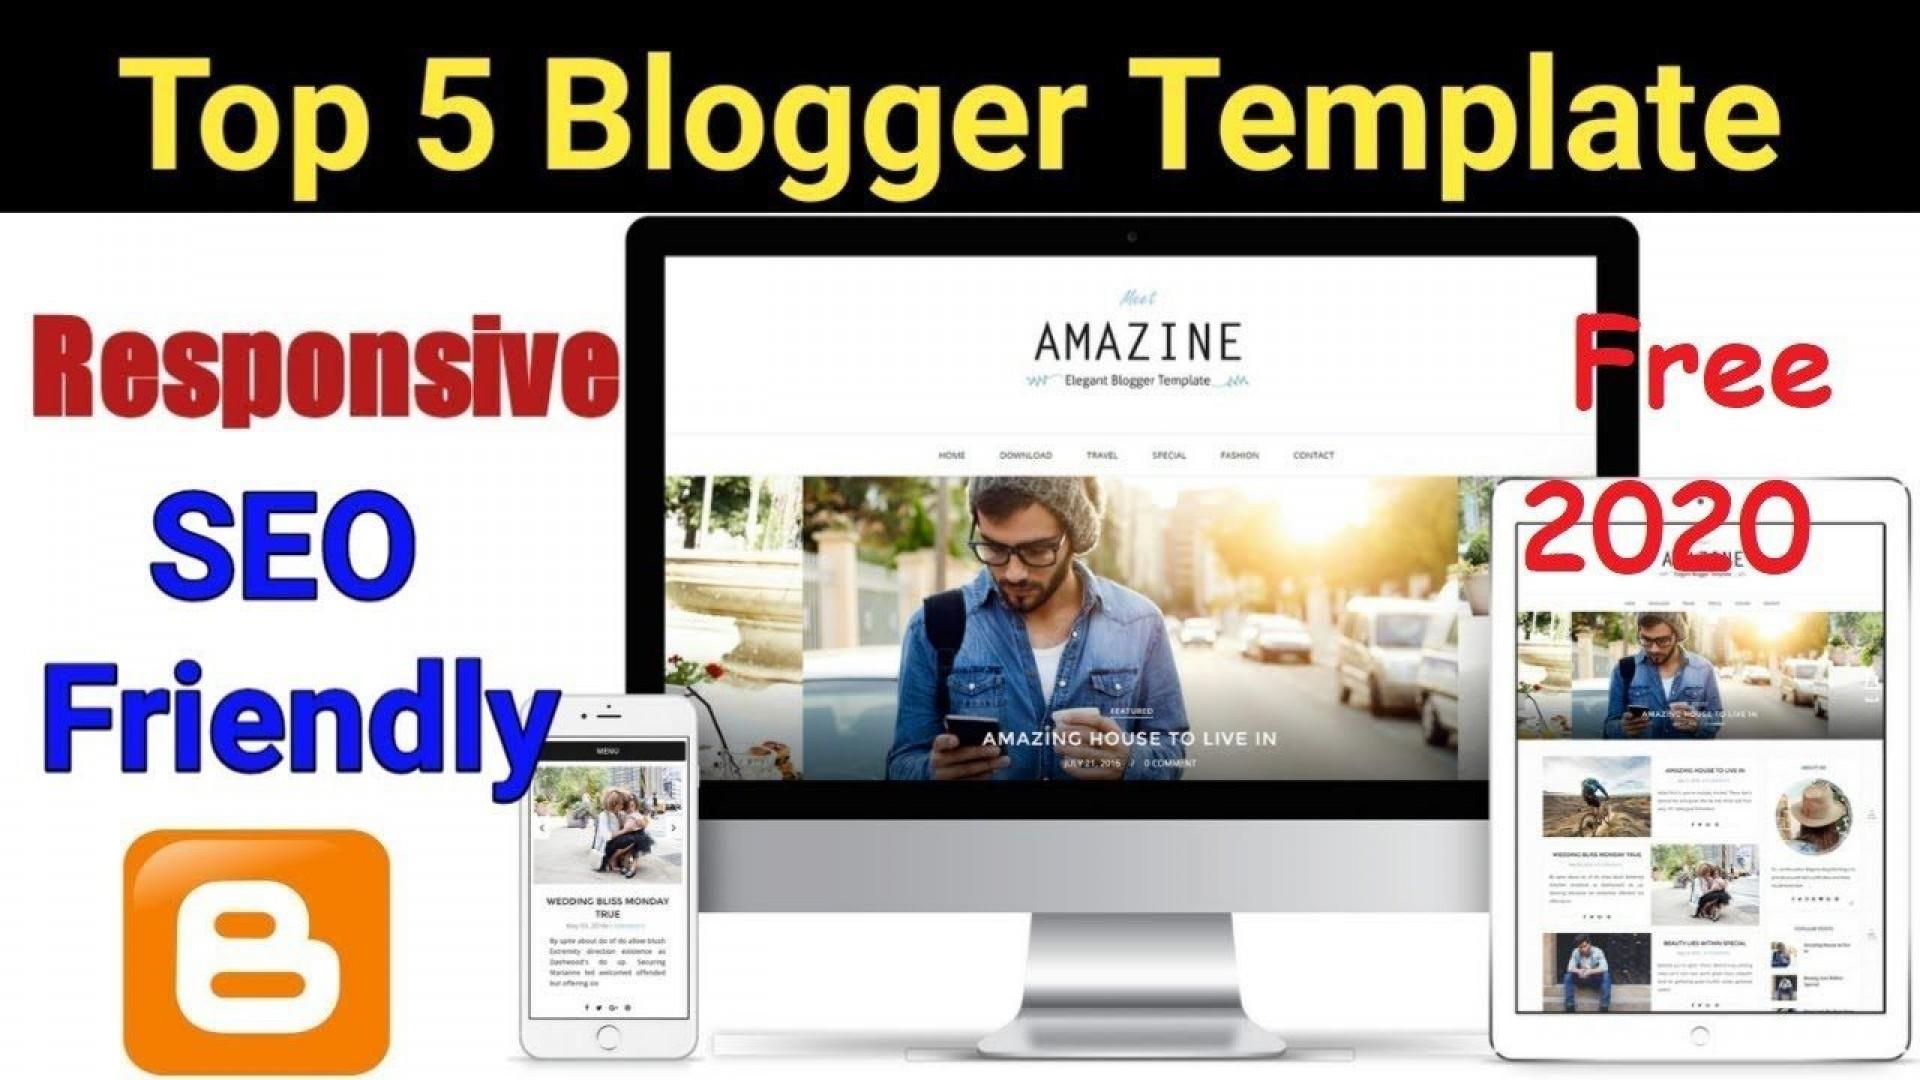 005 Impressive Free Seo Responsive Blogger Template High Resolution  Templates1920